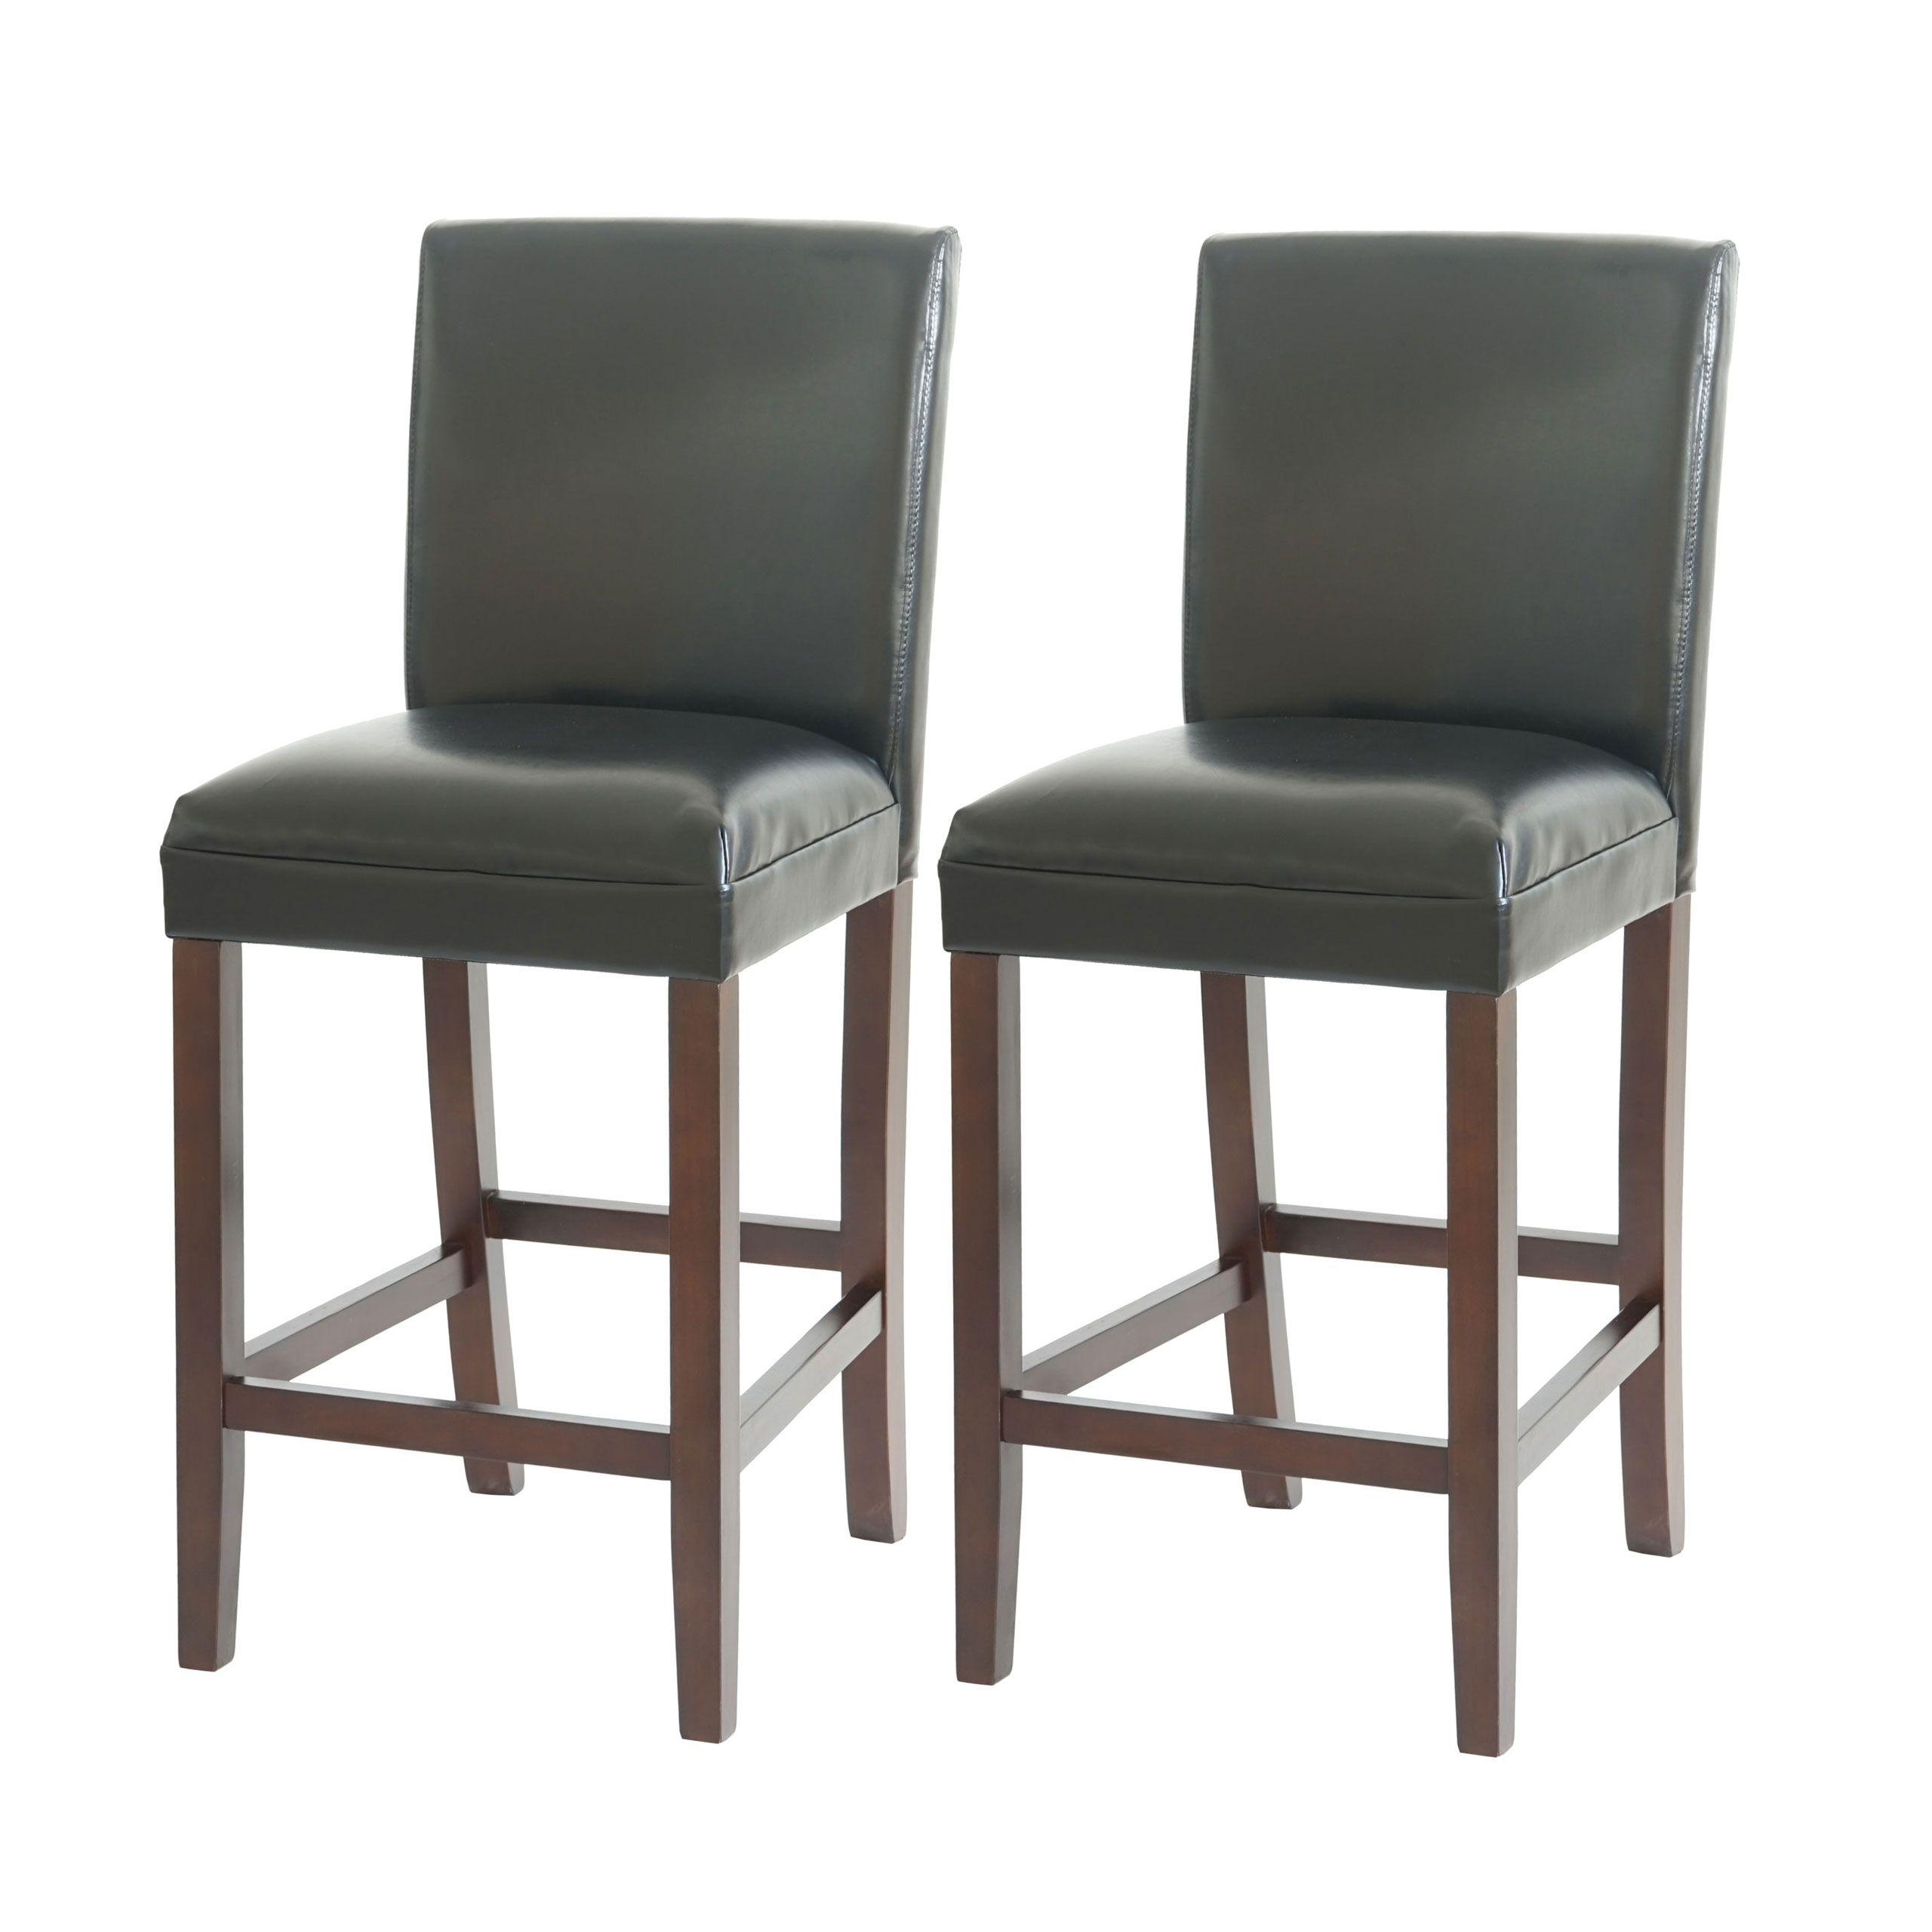 2x Barstuhl Xxl Barhocker Austin Leder Us Version 150kg Home Decor Furniture Bar Stools